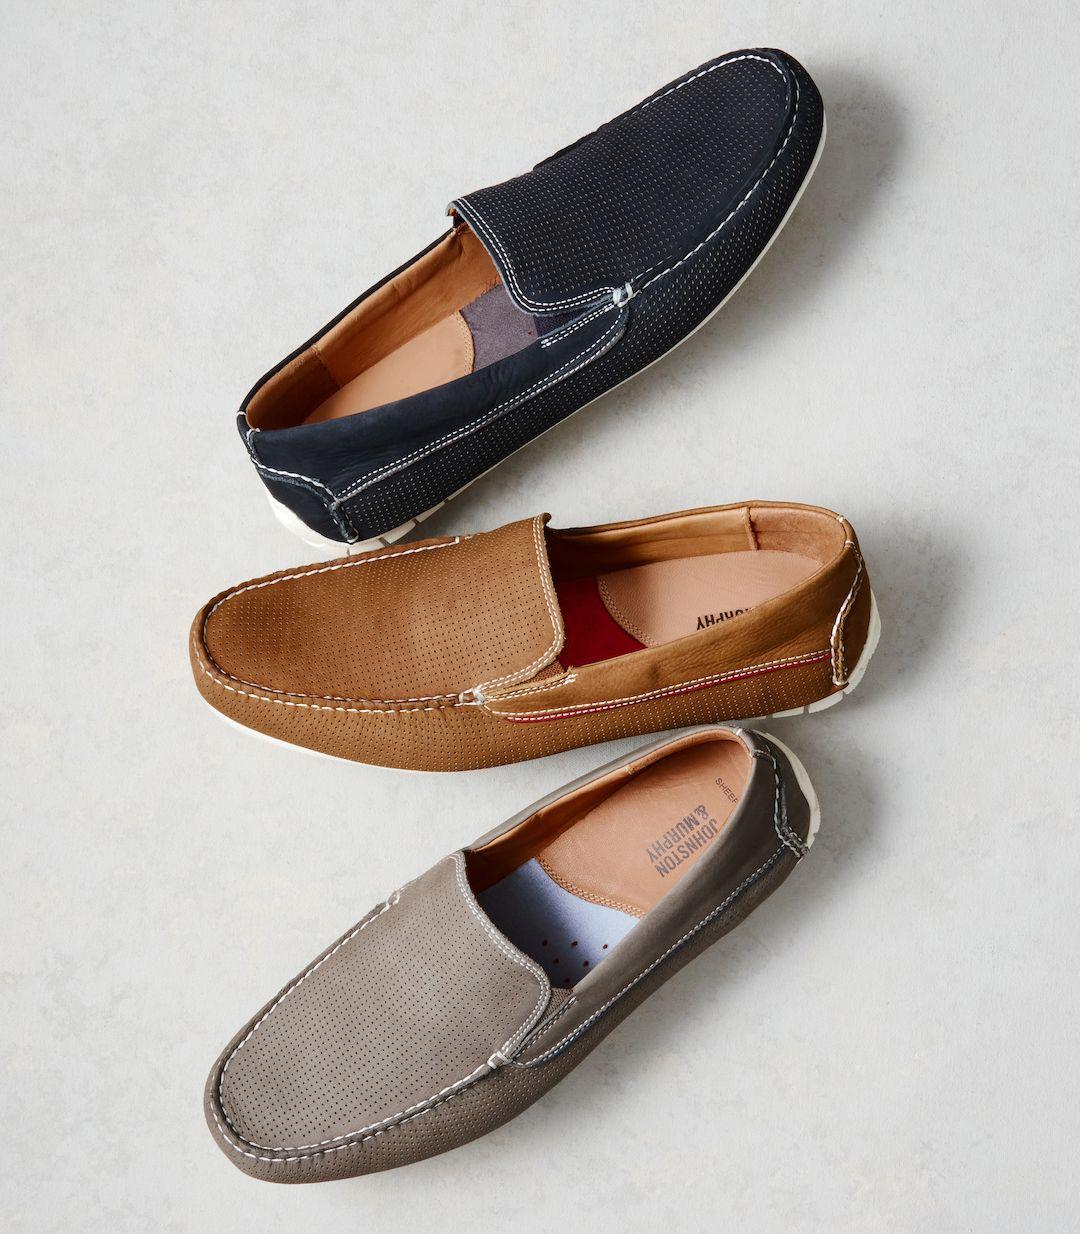 Cort Perf Venetian Dress Shoes Men Loafers Men Casual Shoes [ 1234 x 1080 Pixel ]